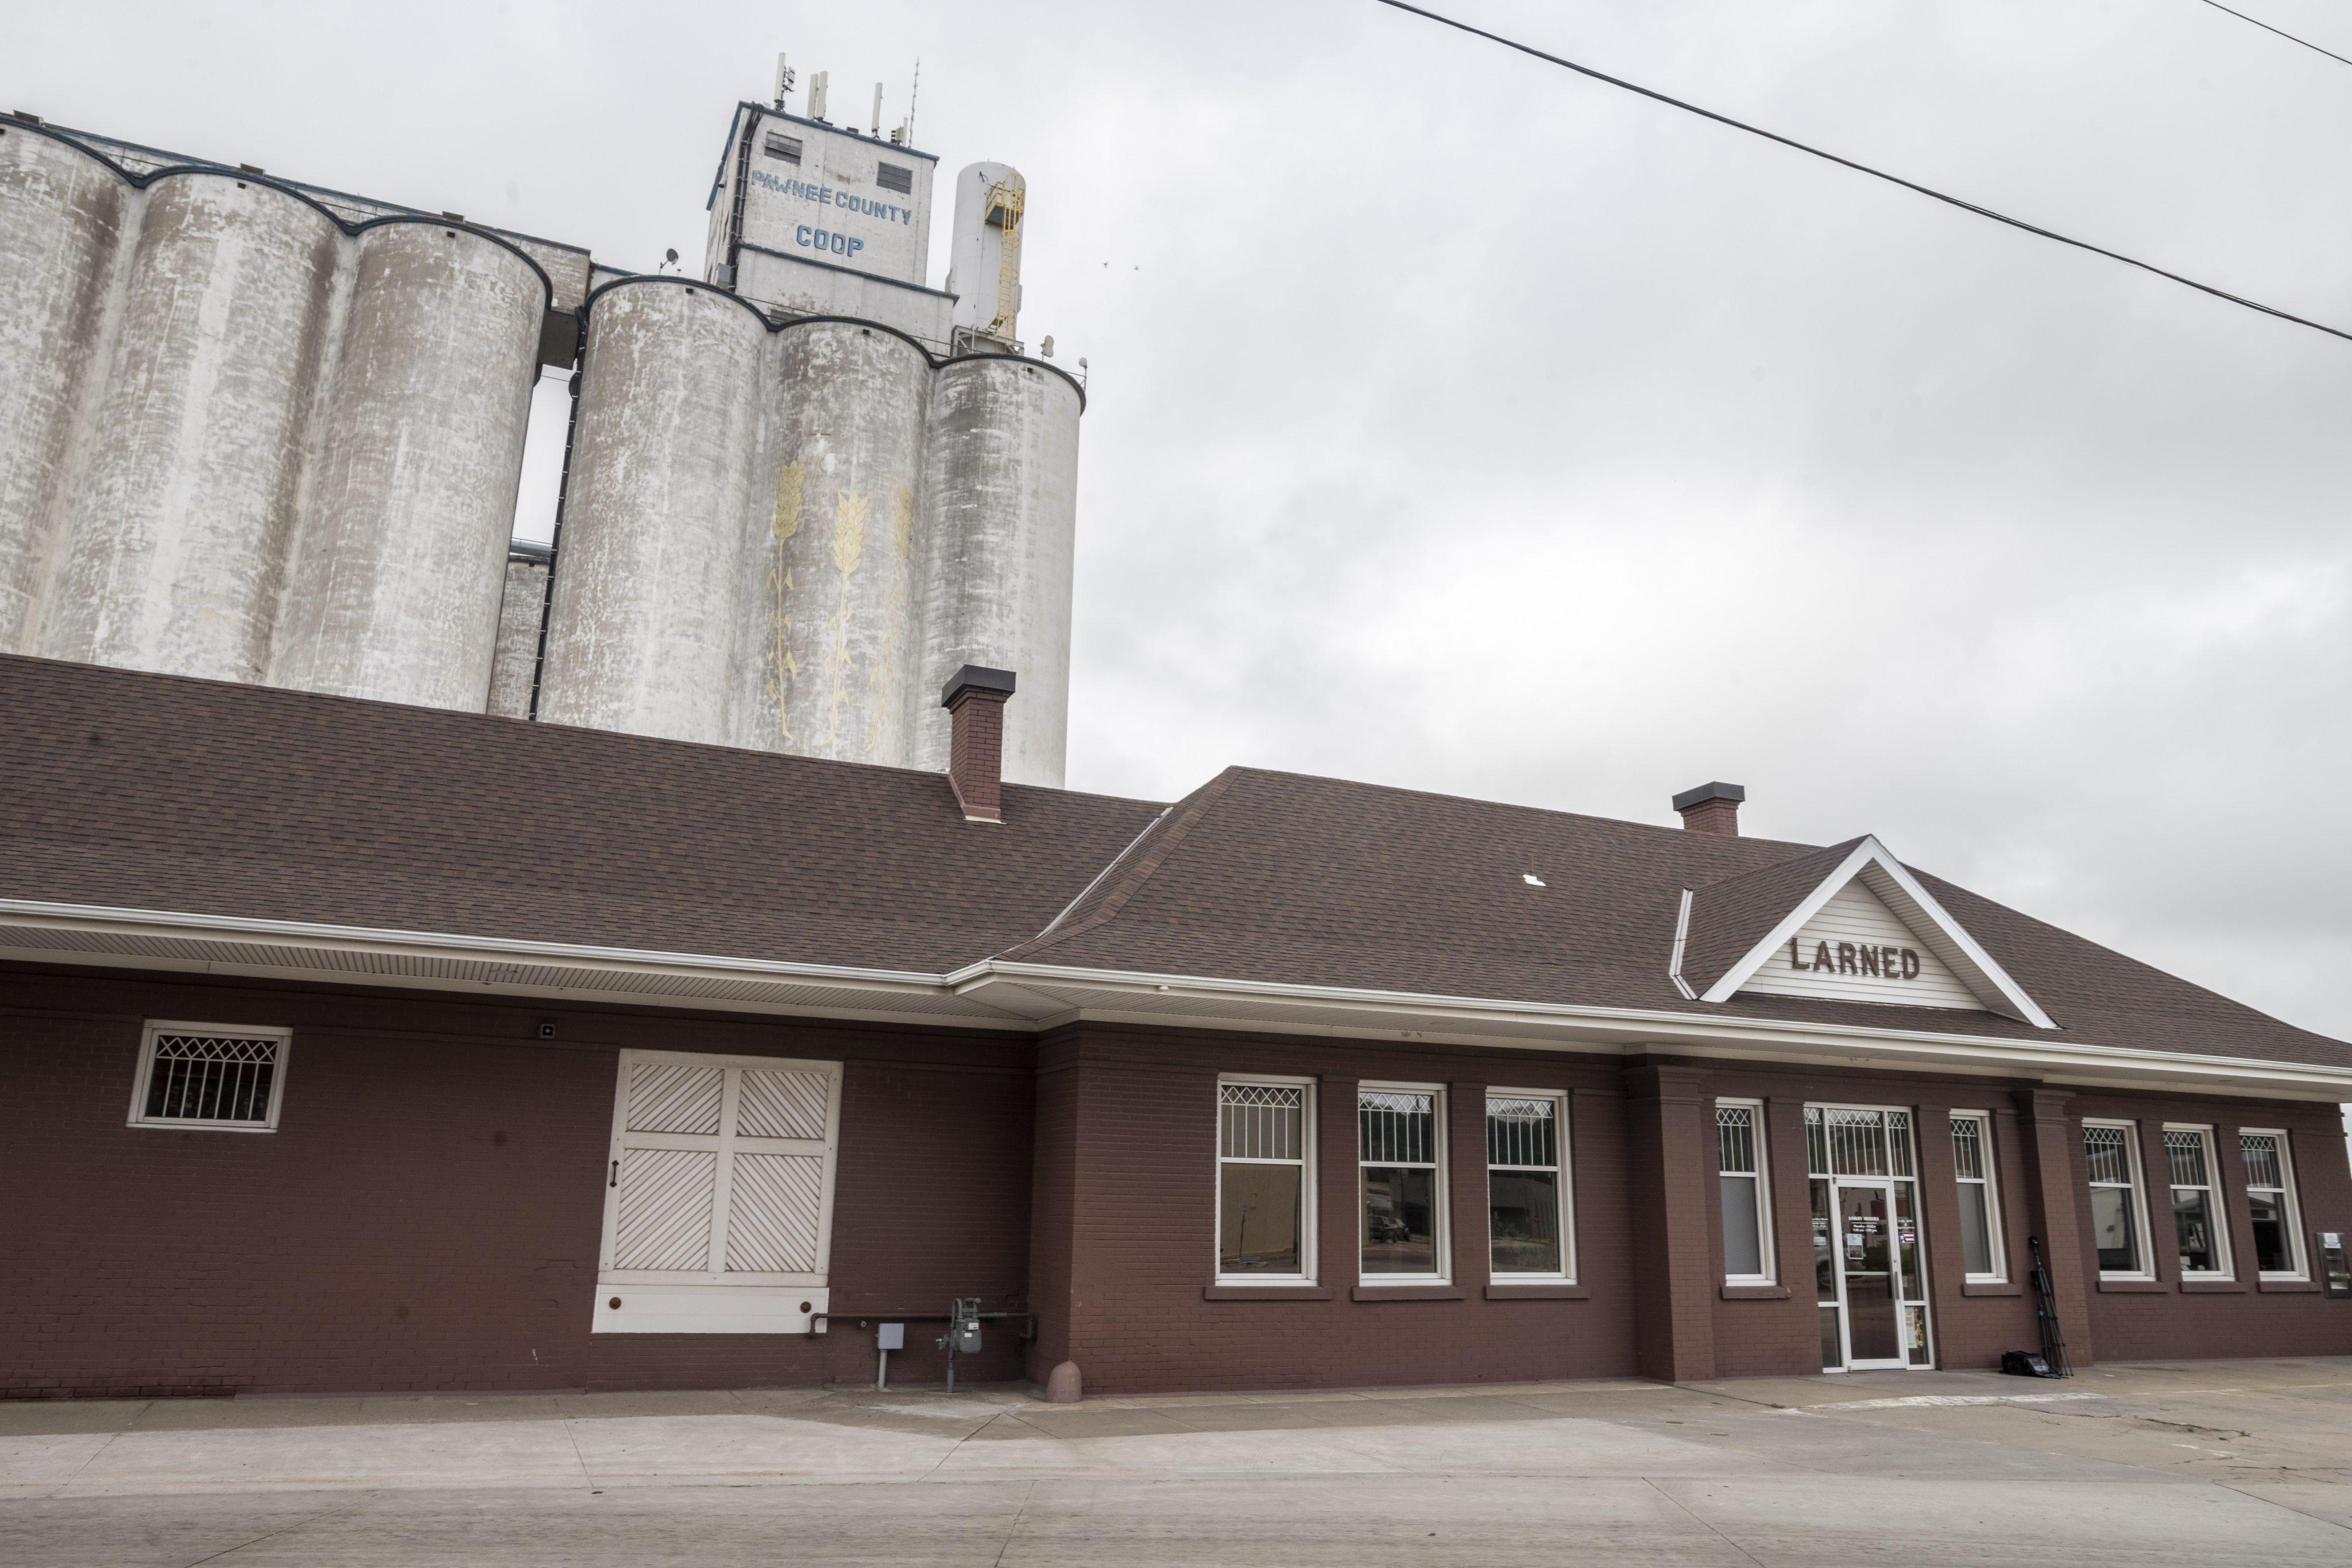 Atchison Topeka and Santa Fe Railway Company depot, Larned, Kansas